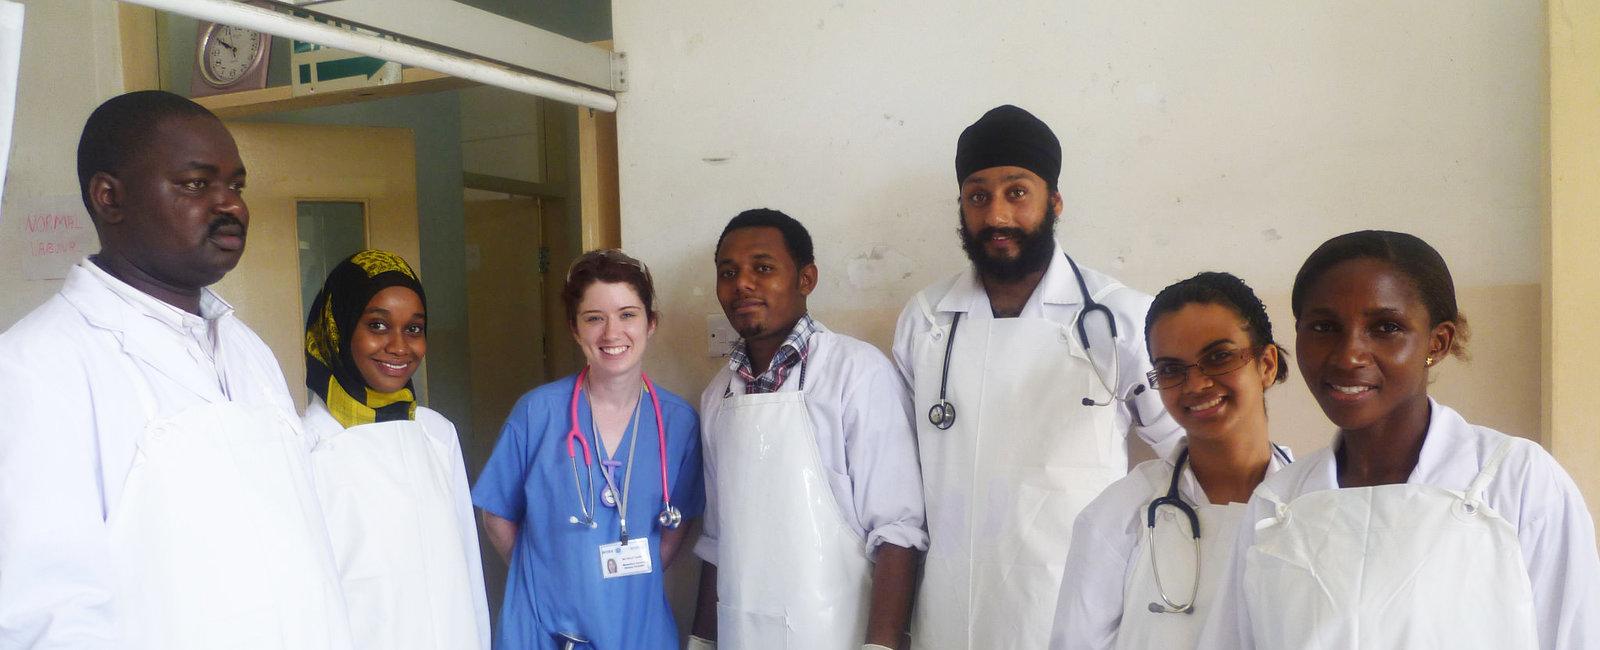 Michelle Causer - Midwifery Electives in Tanzania Dar es Salaam